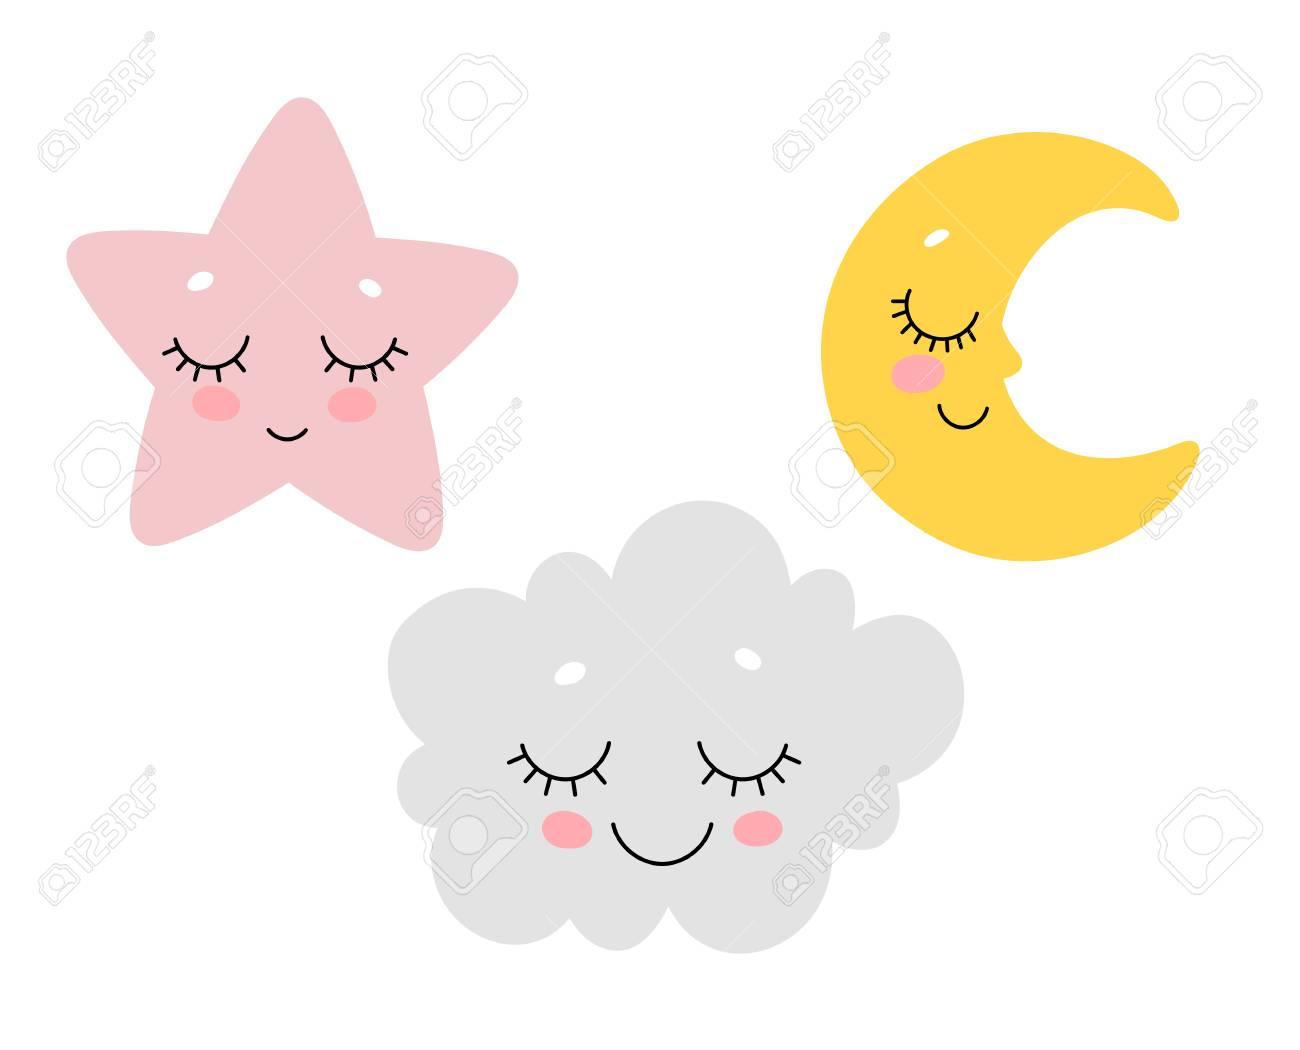 Vector illustration of cute sleeping cloud, moon and star. Scandinavian nursery print design. - 109652010